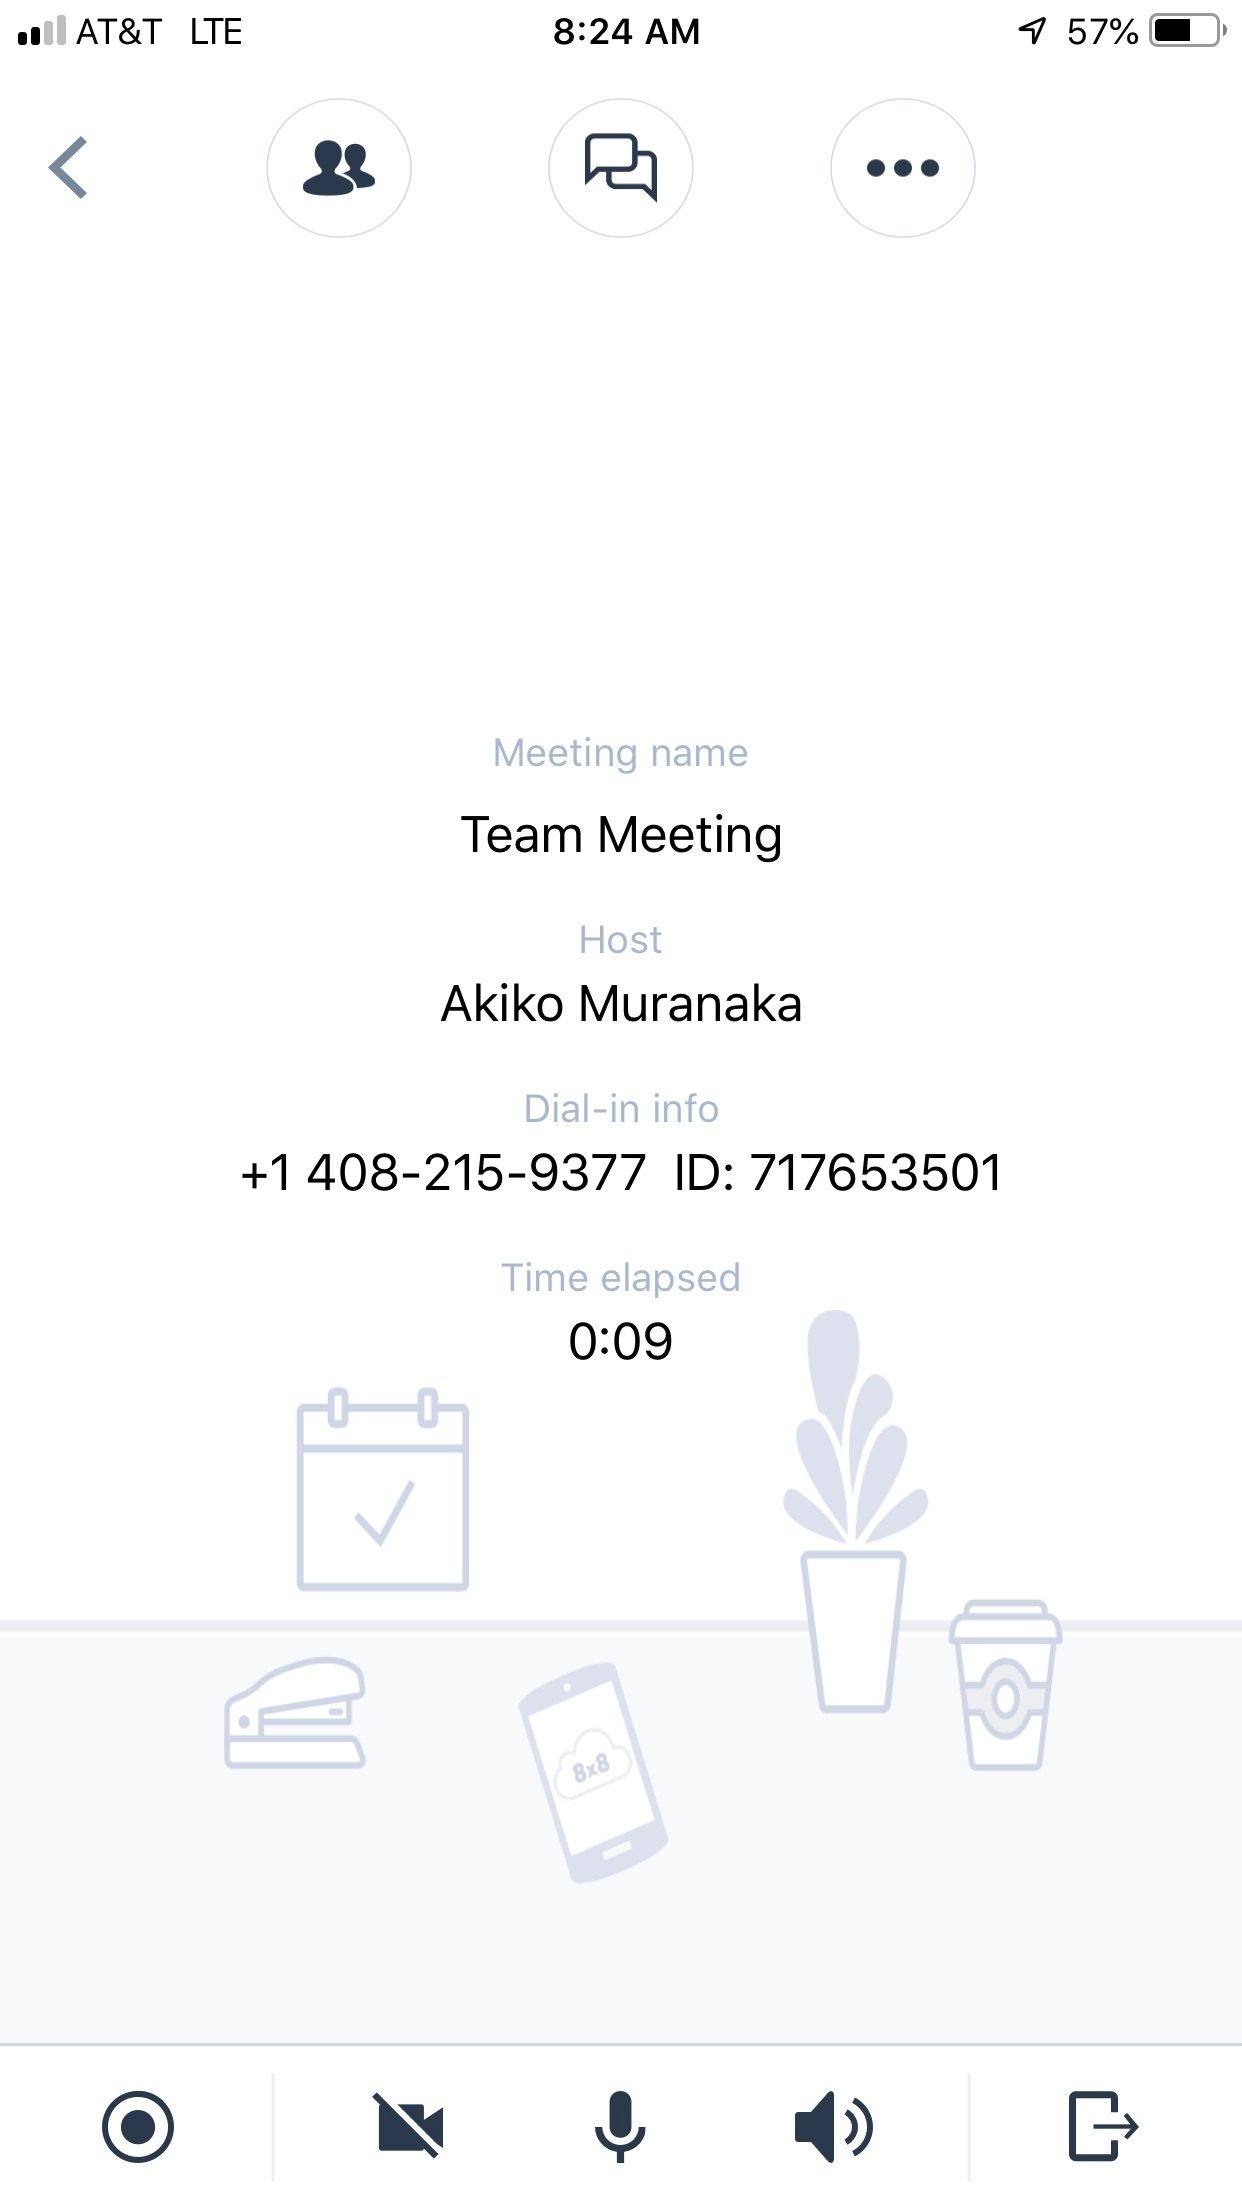 VOM7.4_Meetings_V02.jpg